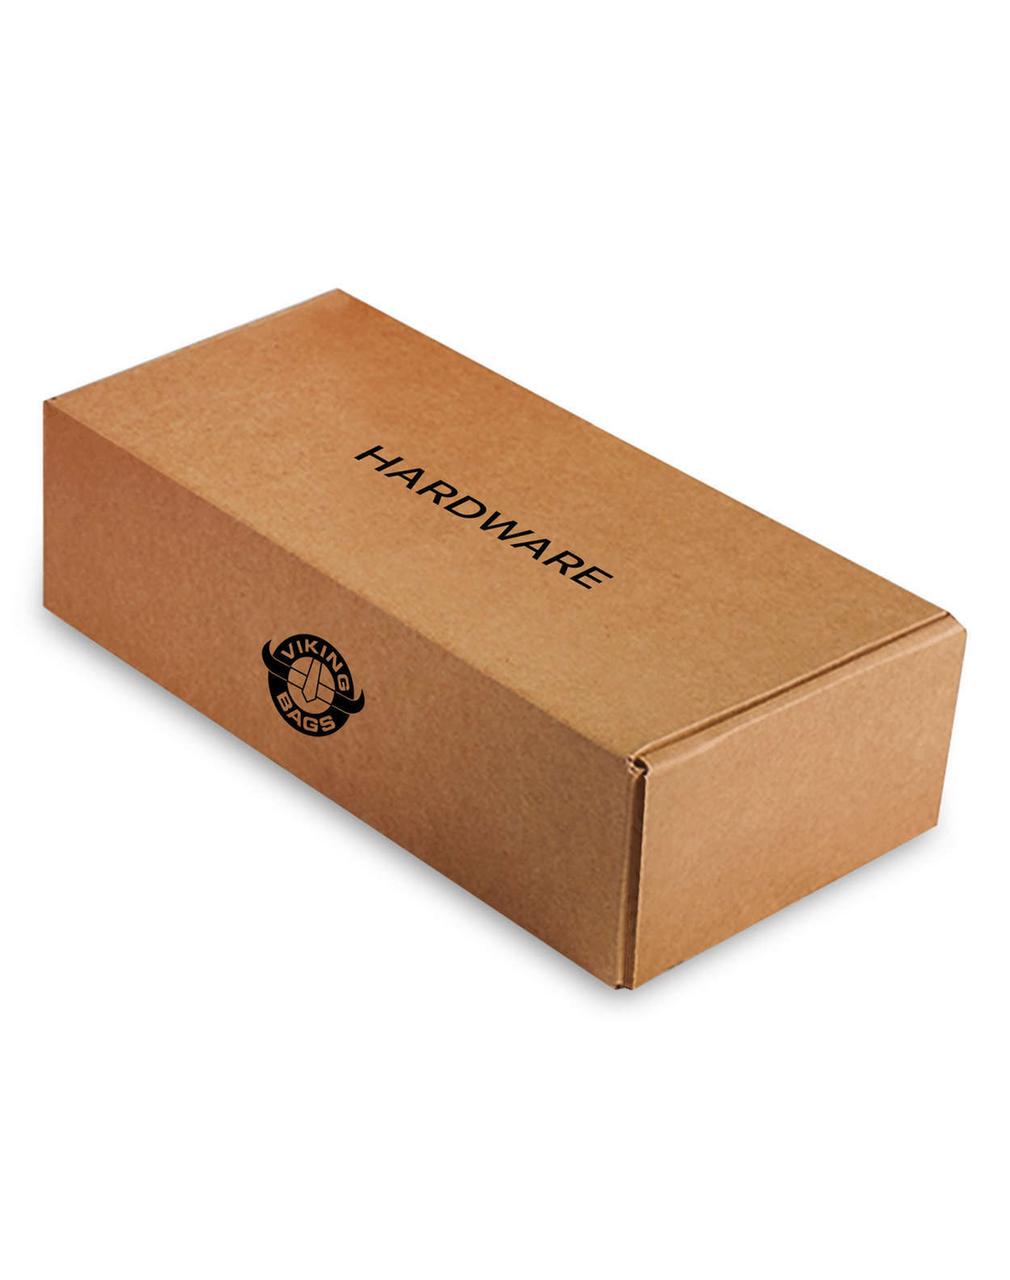 Honda VTX 1800 R Charger Slanted Medium Motorcycle Saddlebags Hardware Box